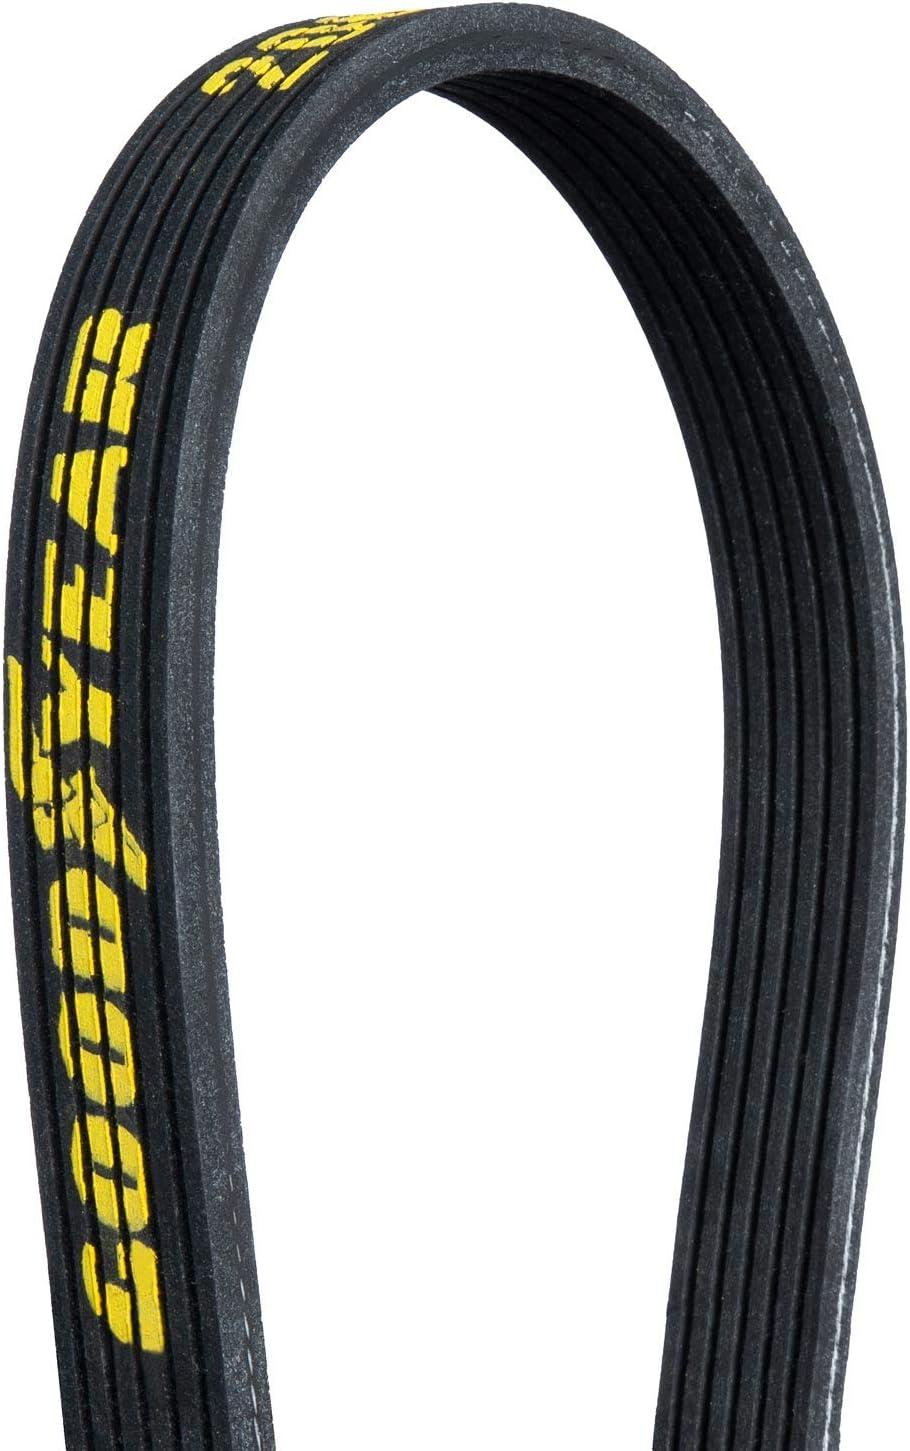 85.9 Length Goodyear 2060859 Dual Sided Serpentine Belt 6-Rib